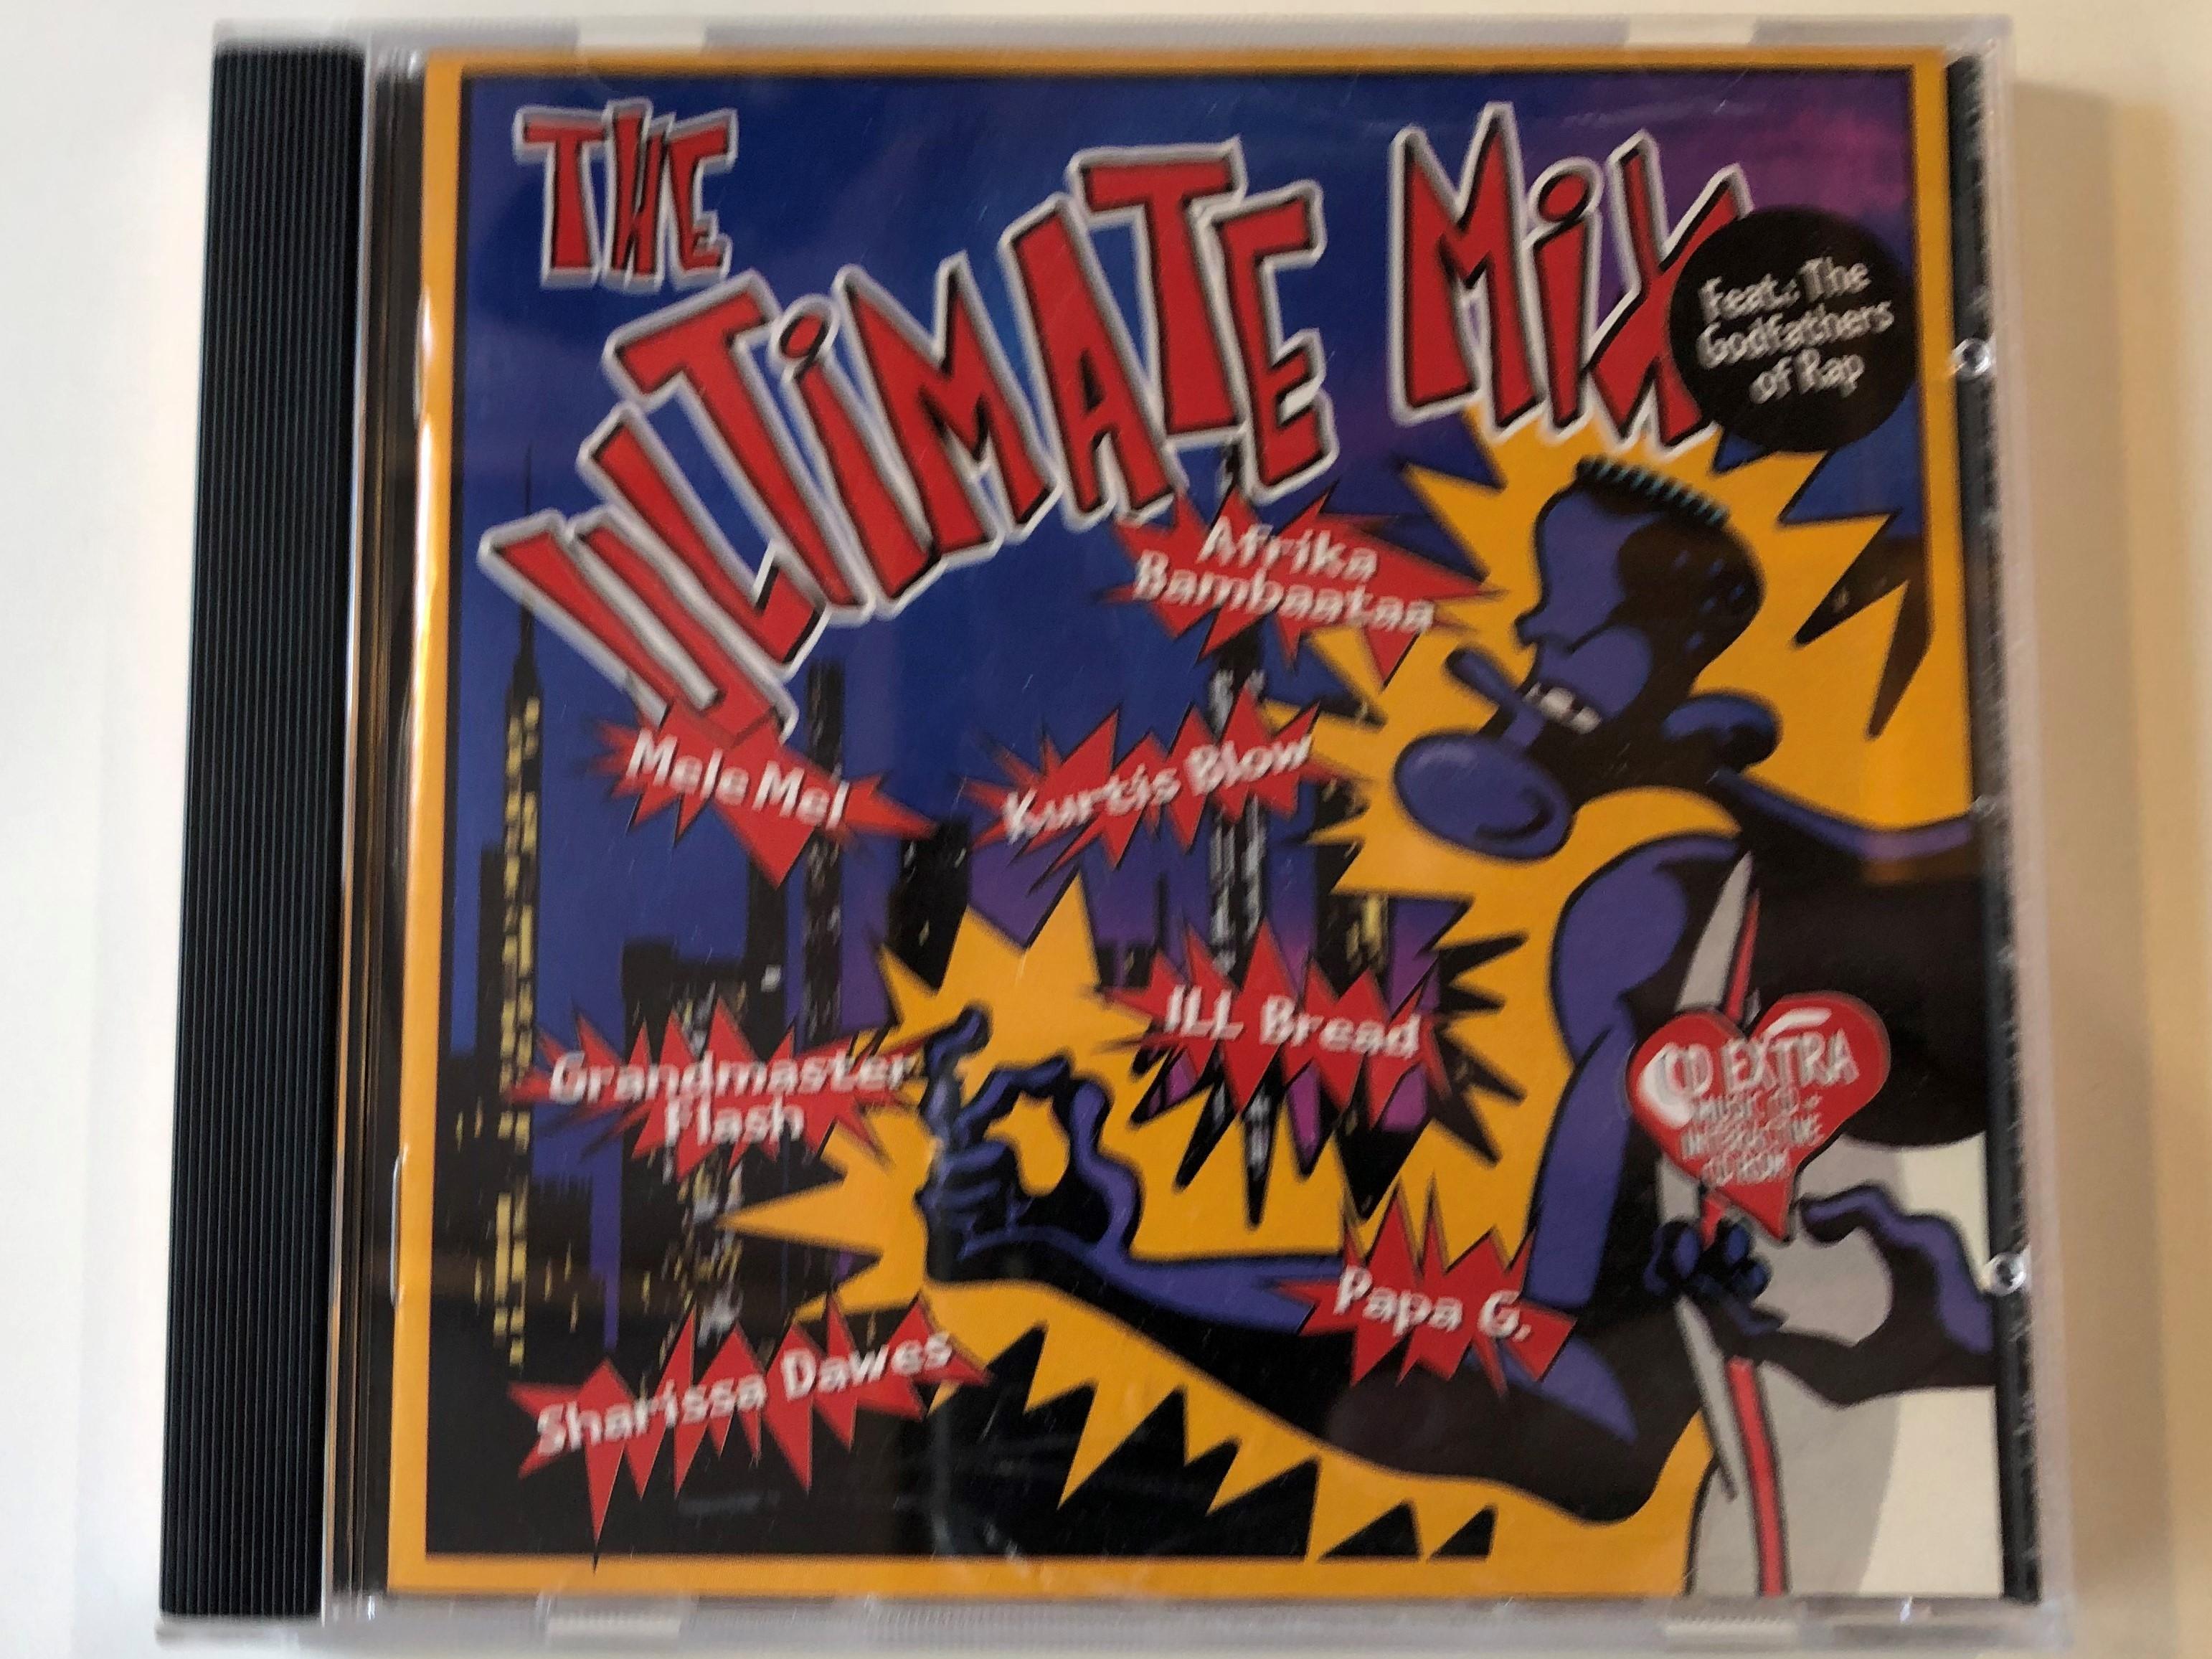 the-ultimate-mix-feat.-the-godfathers-of-rap-afrika-bambaataa-kurtis-blow-mele-mel-grandmaster-flash-ill-bread-sharissa-dawes-papa-g.-ide-audio-cd-1996-0088322ide-1-.jpg